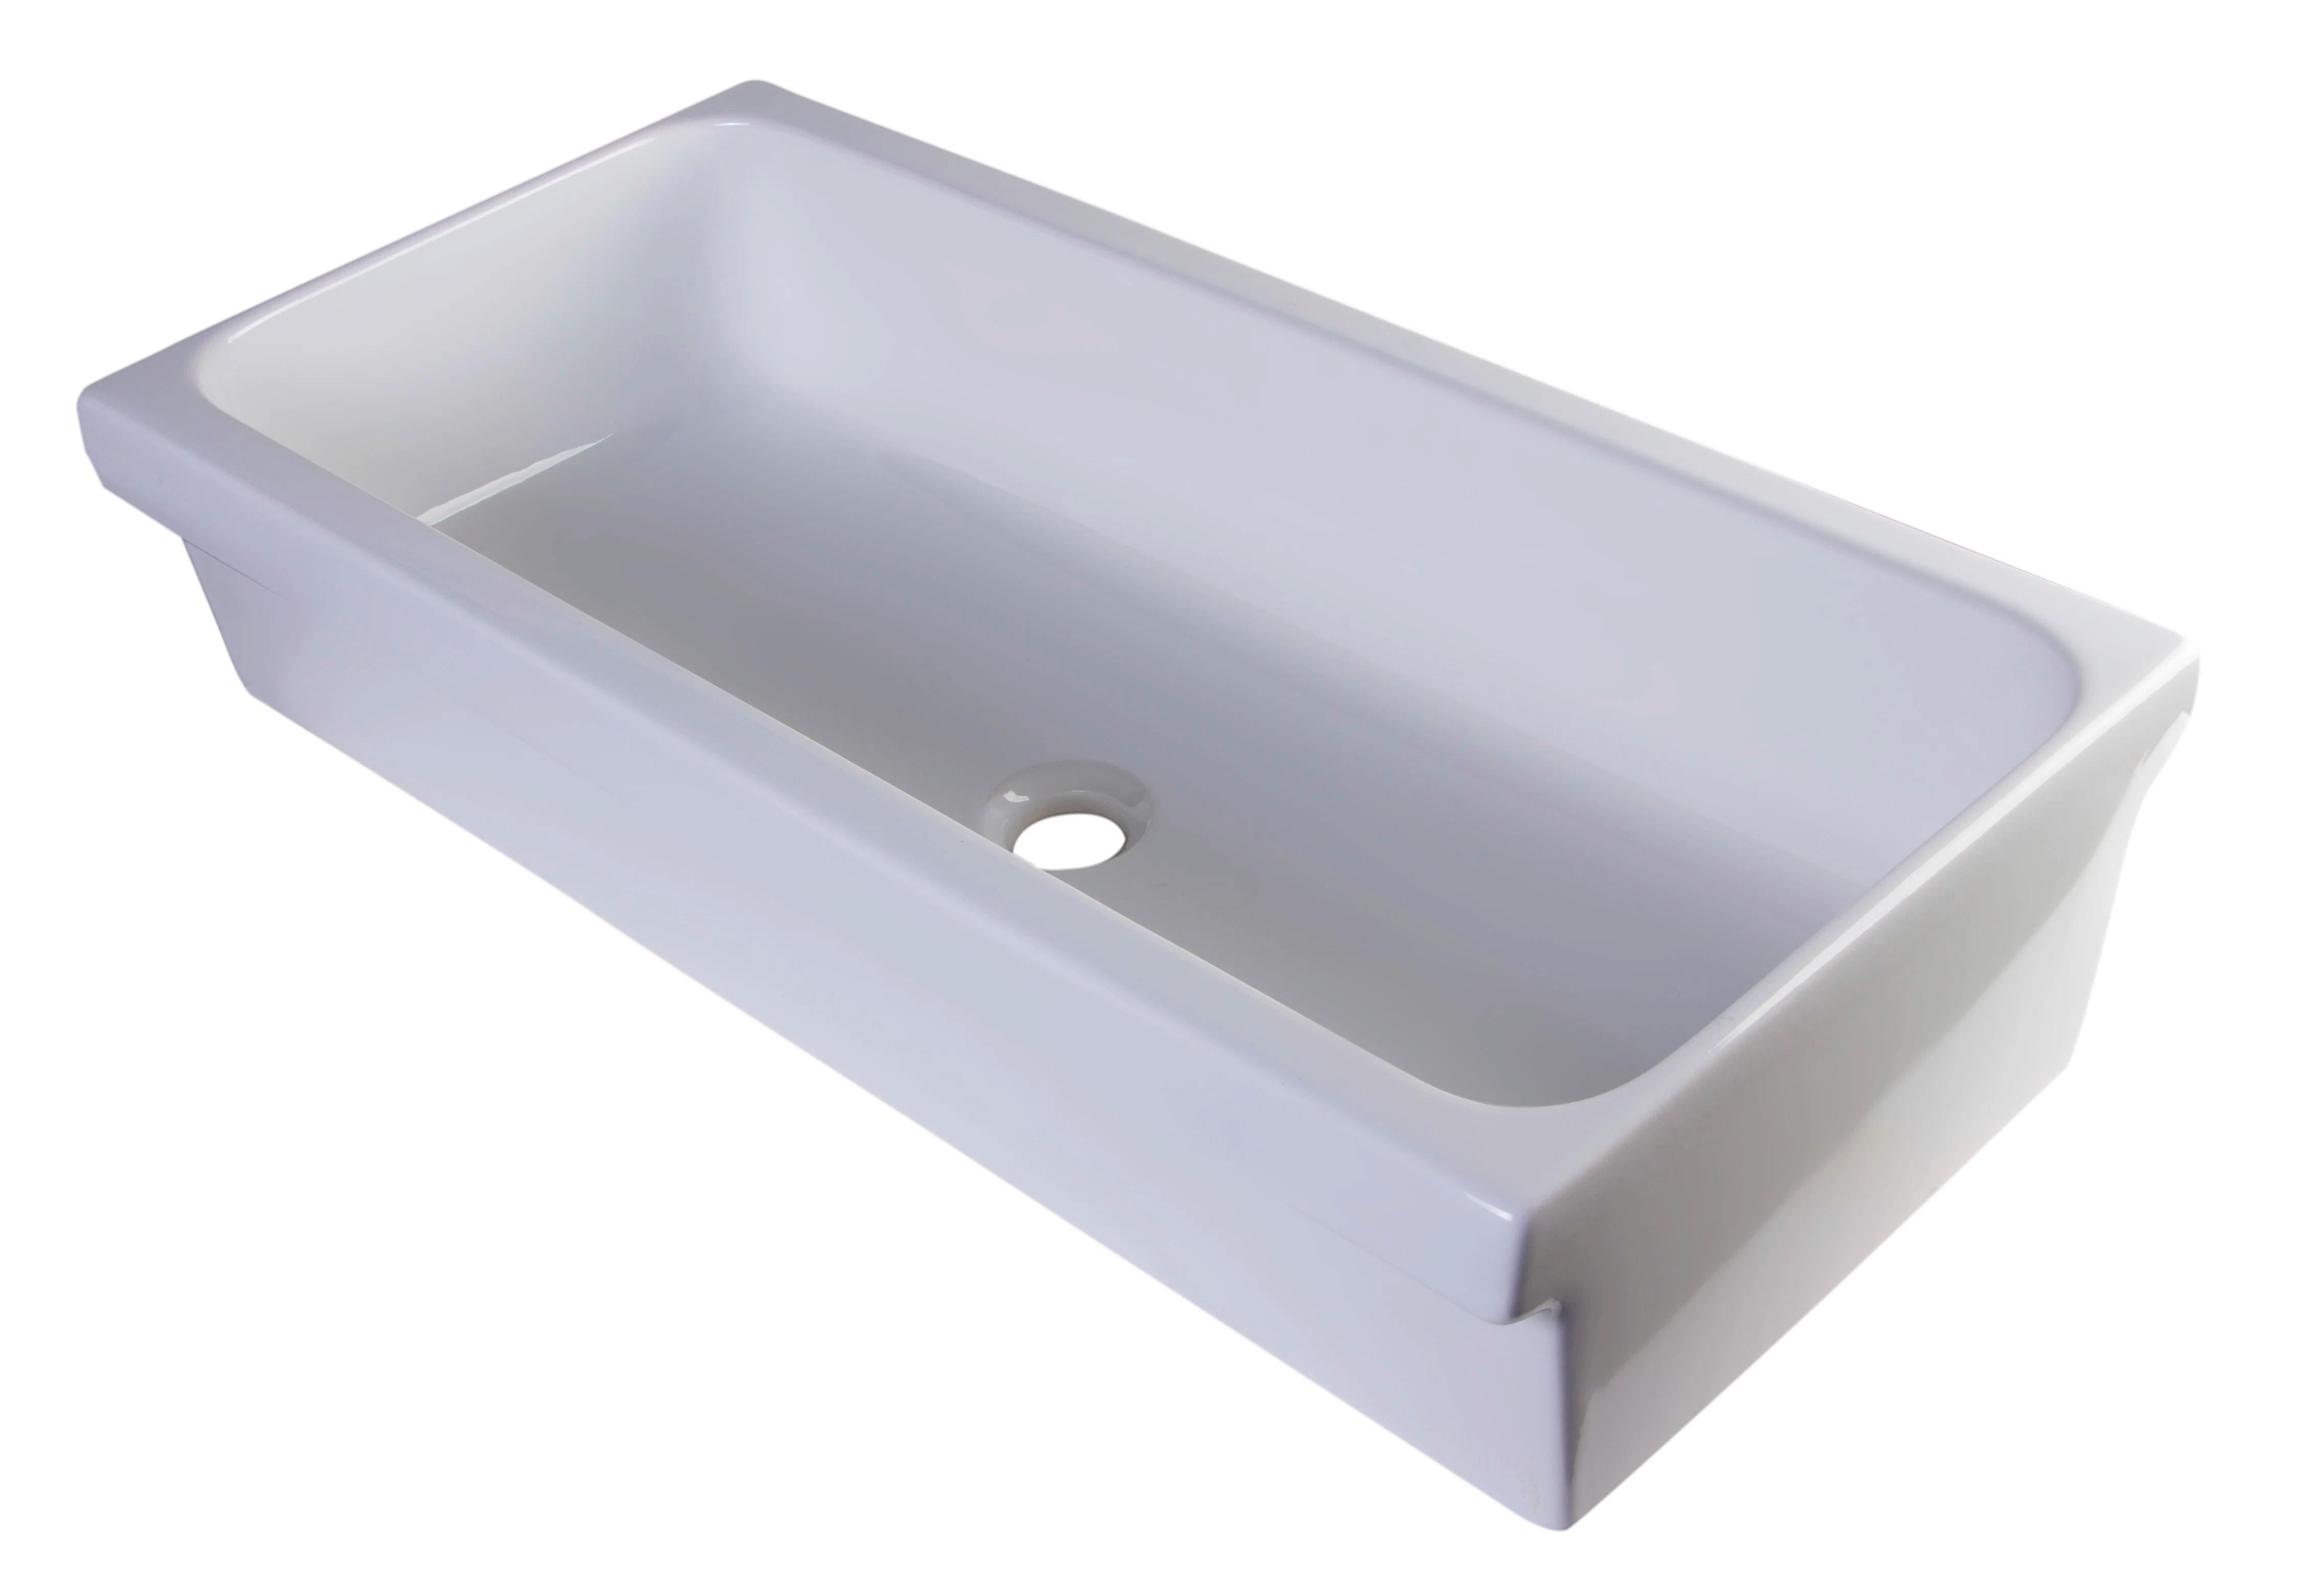 alfi brand fireclay rectangular trough bathroom sink reviews wayfair